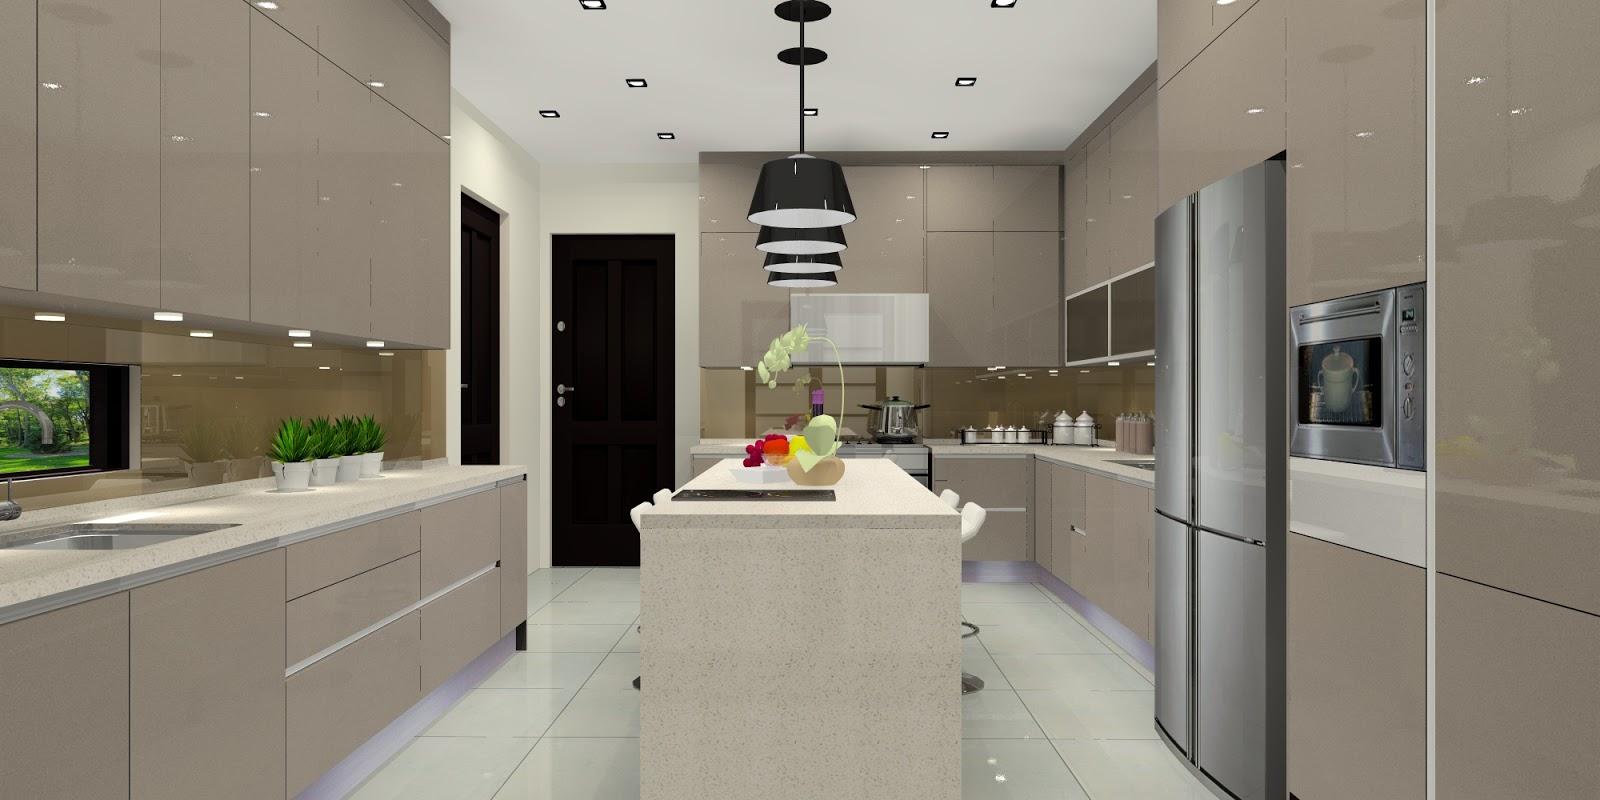 Meridian Interior Design And Kitchen Design In Kuala Lumpur Selangor Malaysia Sleek Linear